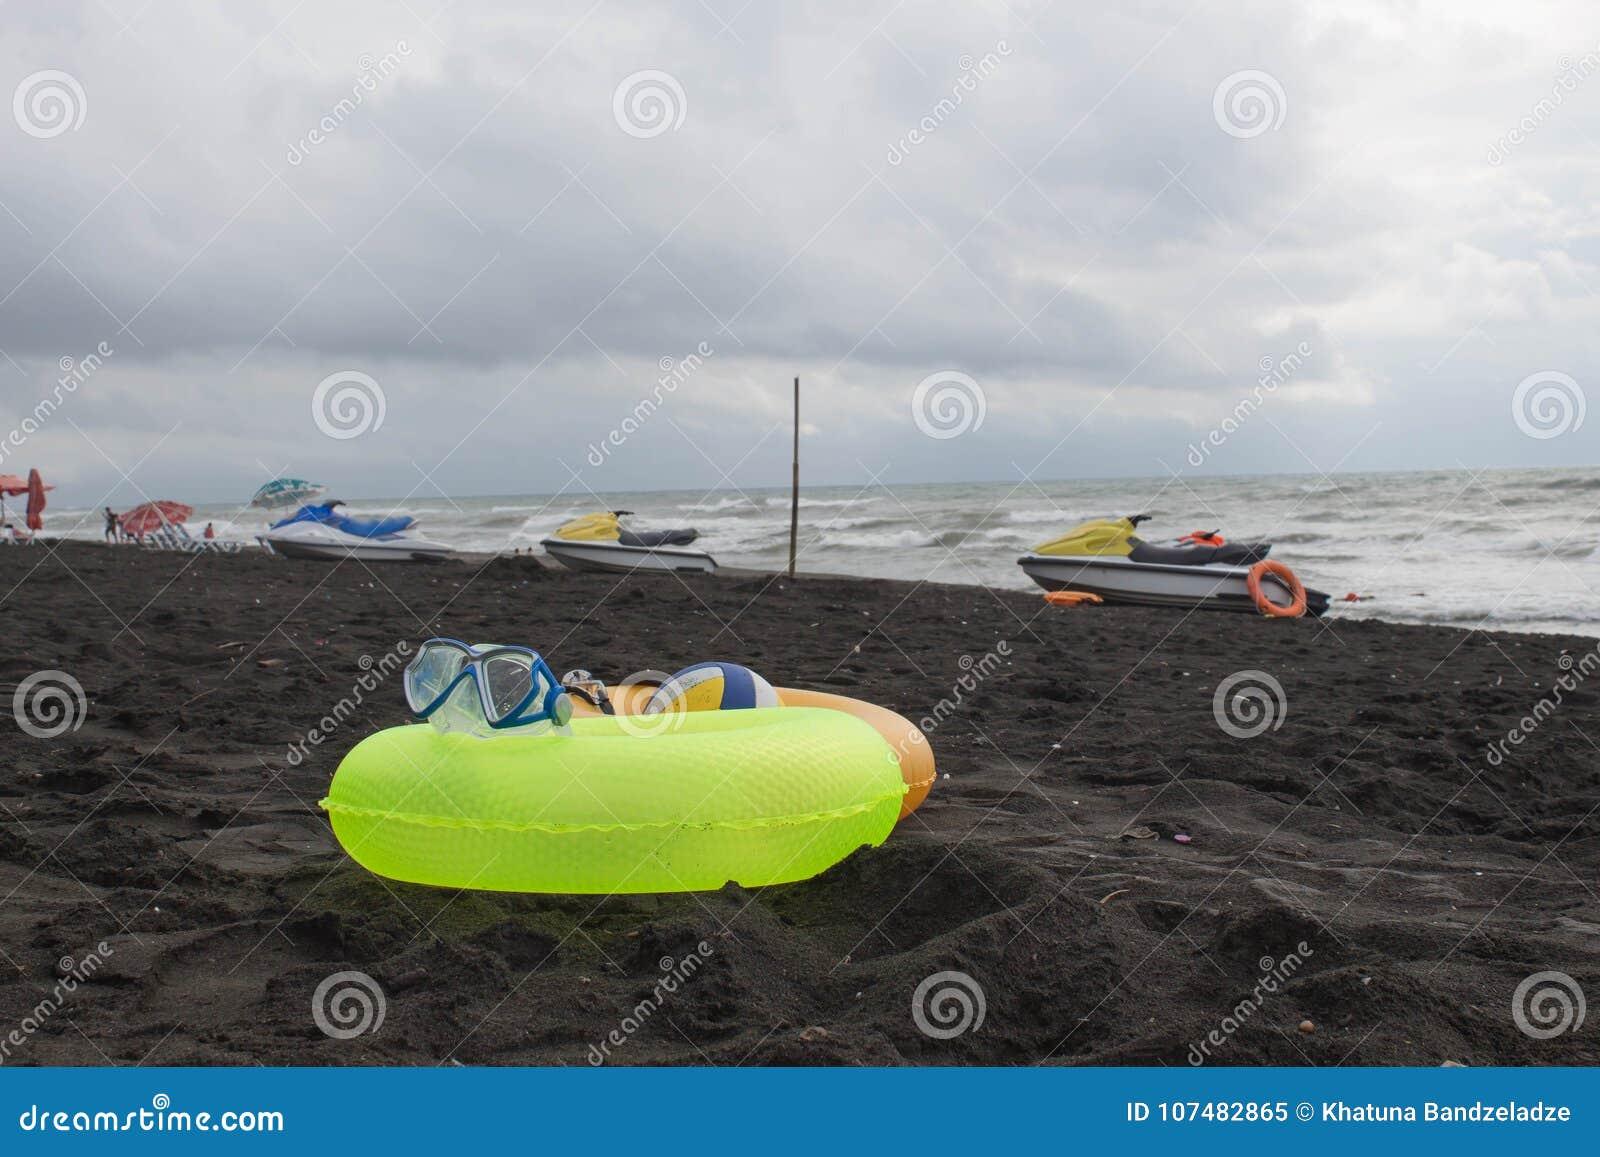 Bal, zwemmende glazen, Waterautoped en Drijvende Ring twee op strand Vage mensen op zandstrand Reis of overzeese vakanties concep